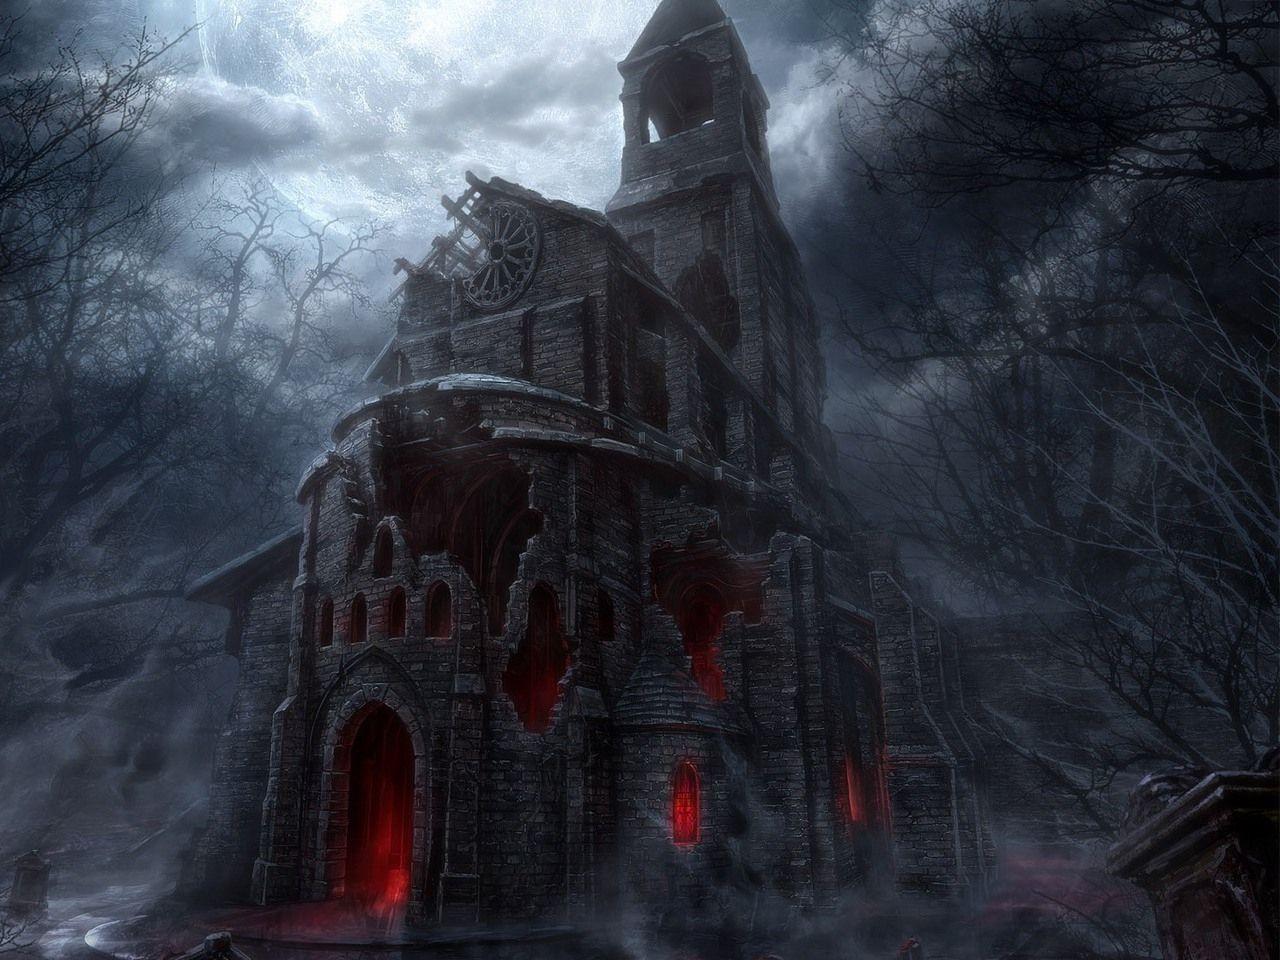 Best Wallpaper Halloween Haunted - bd2ac05049457d299ab637d878421f27  Pic_59937.jpg